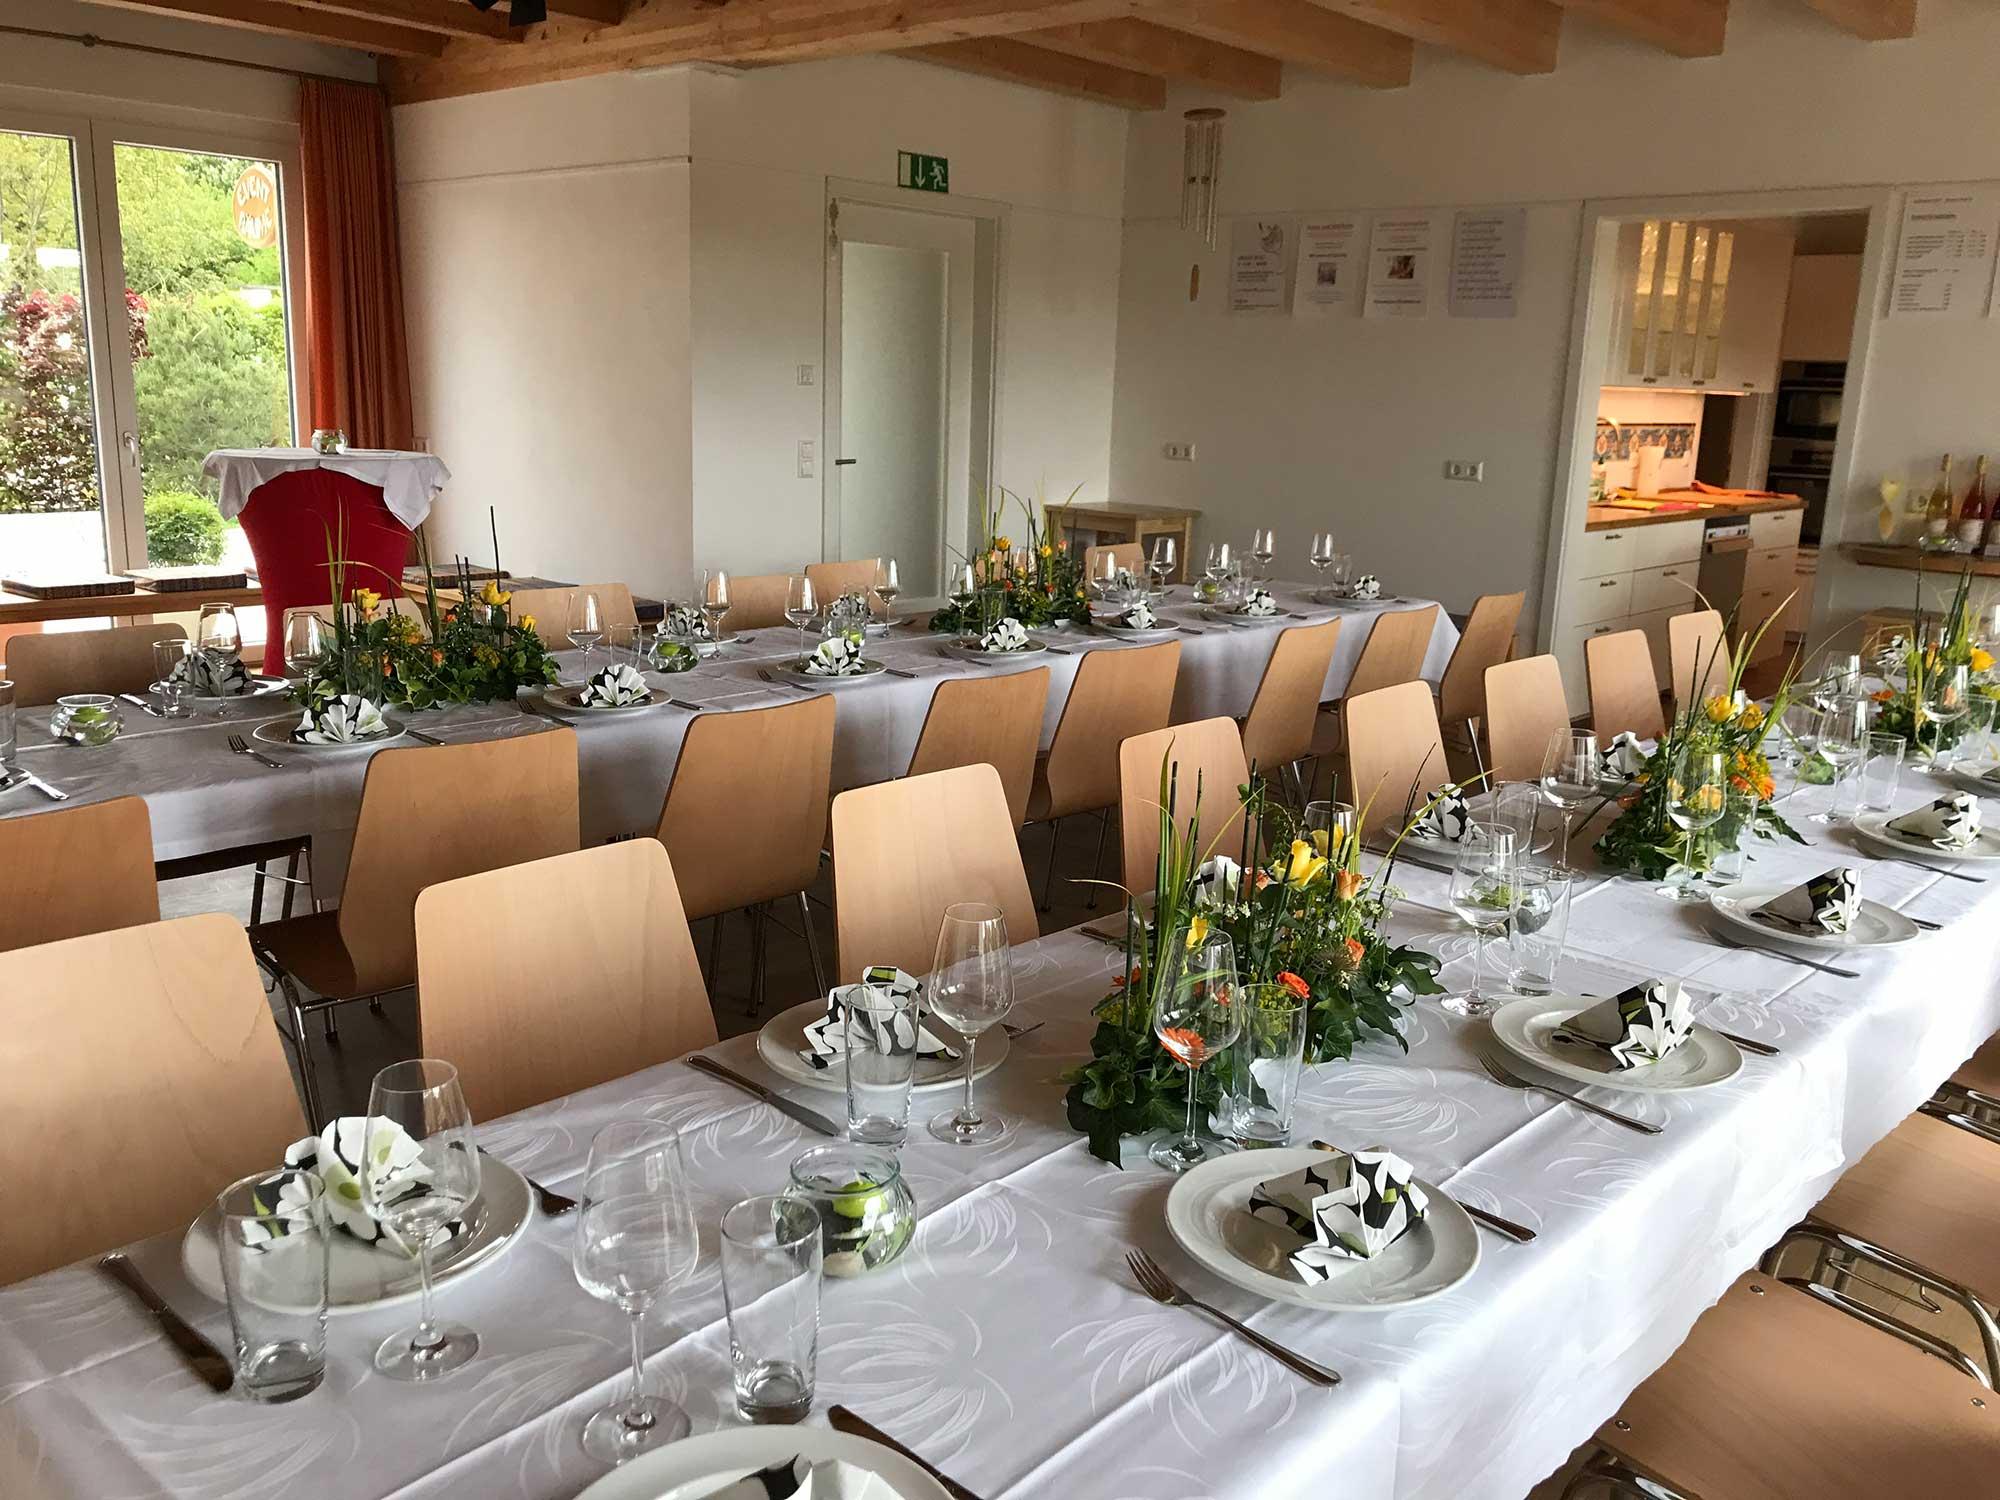 eventraum-tafel2